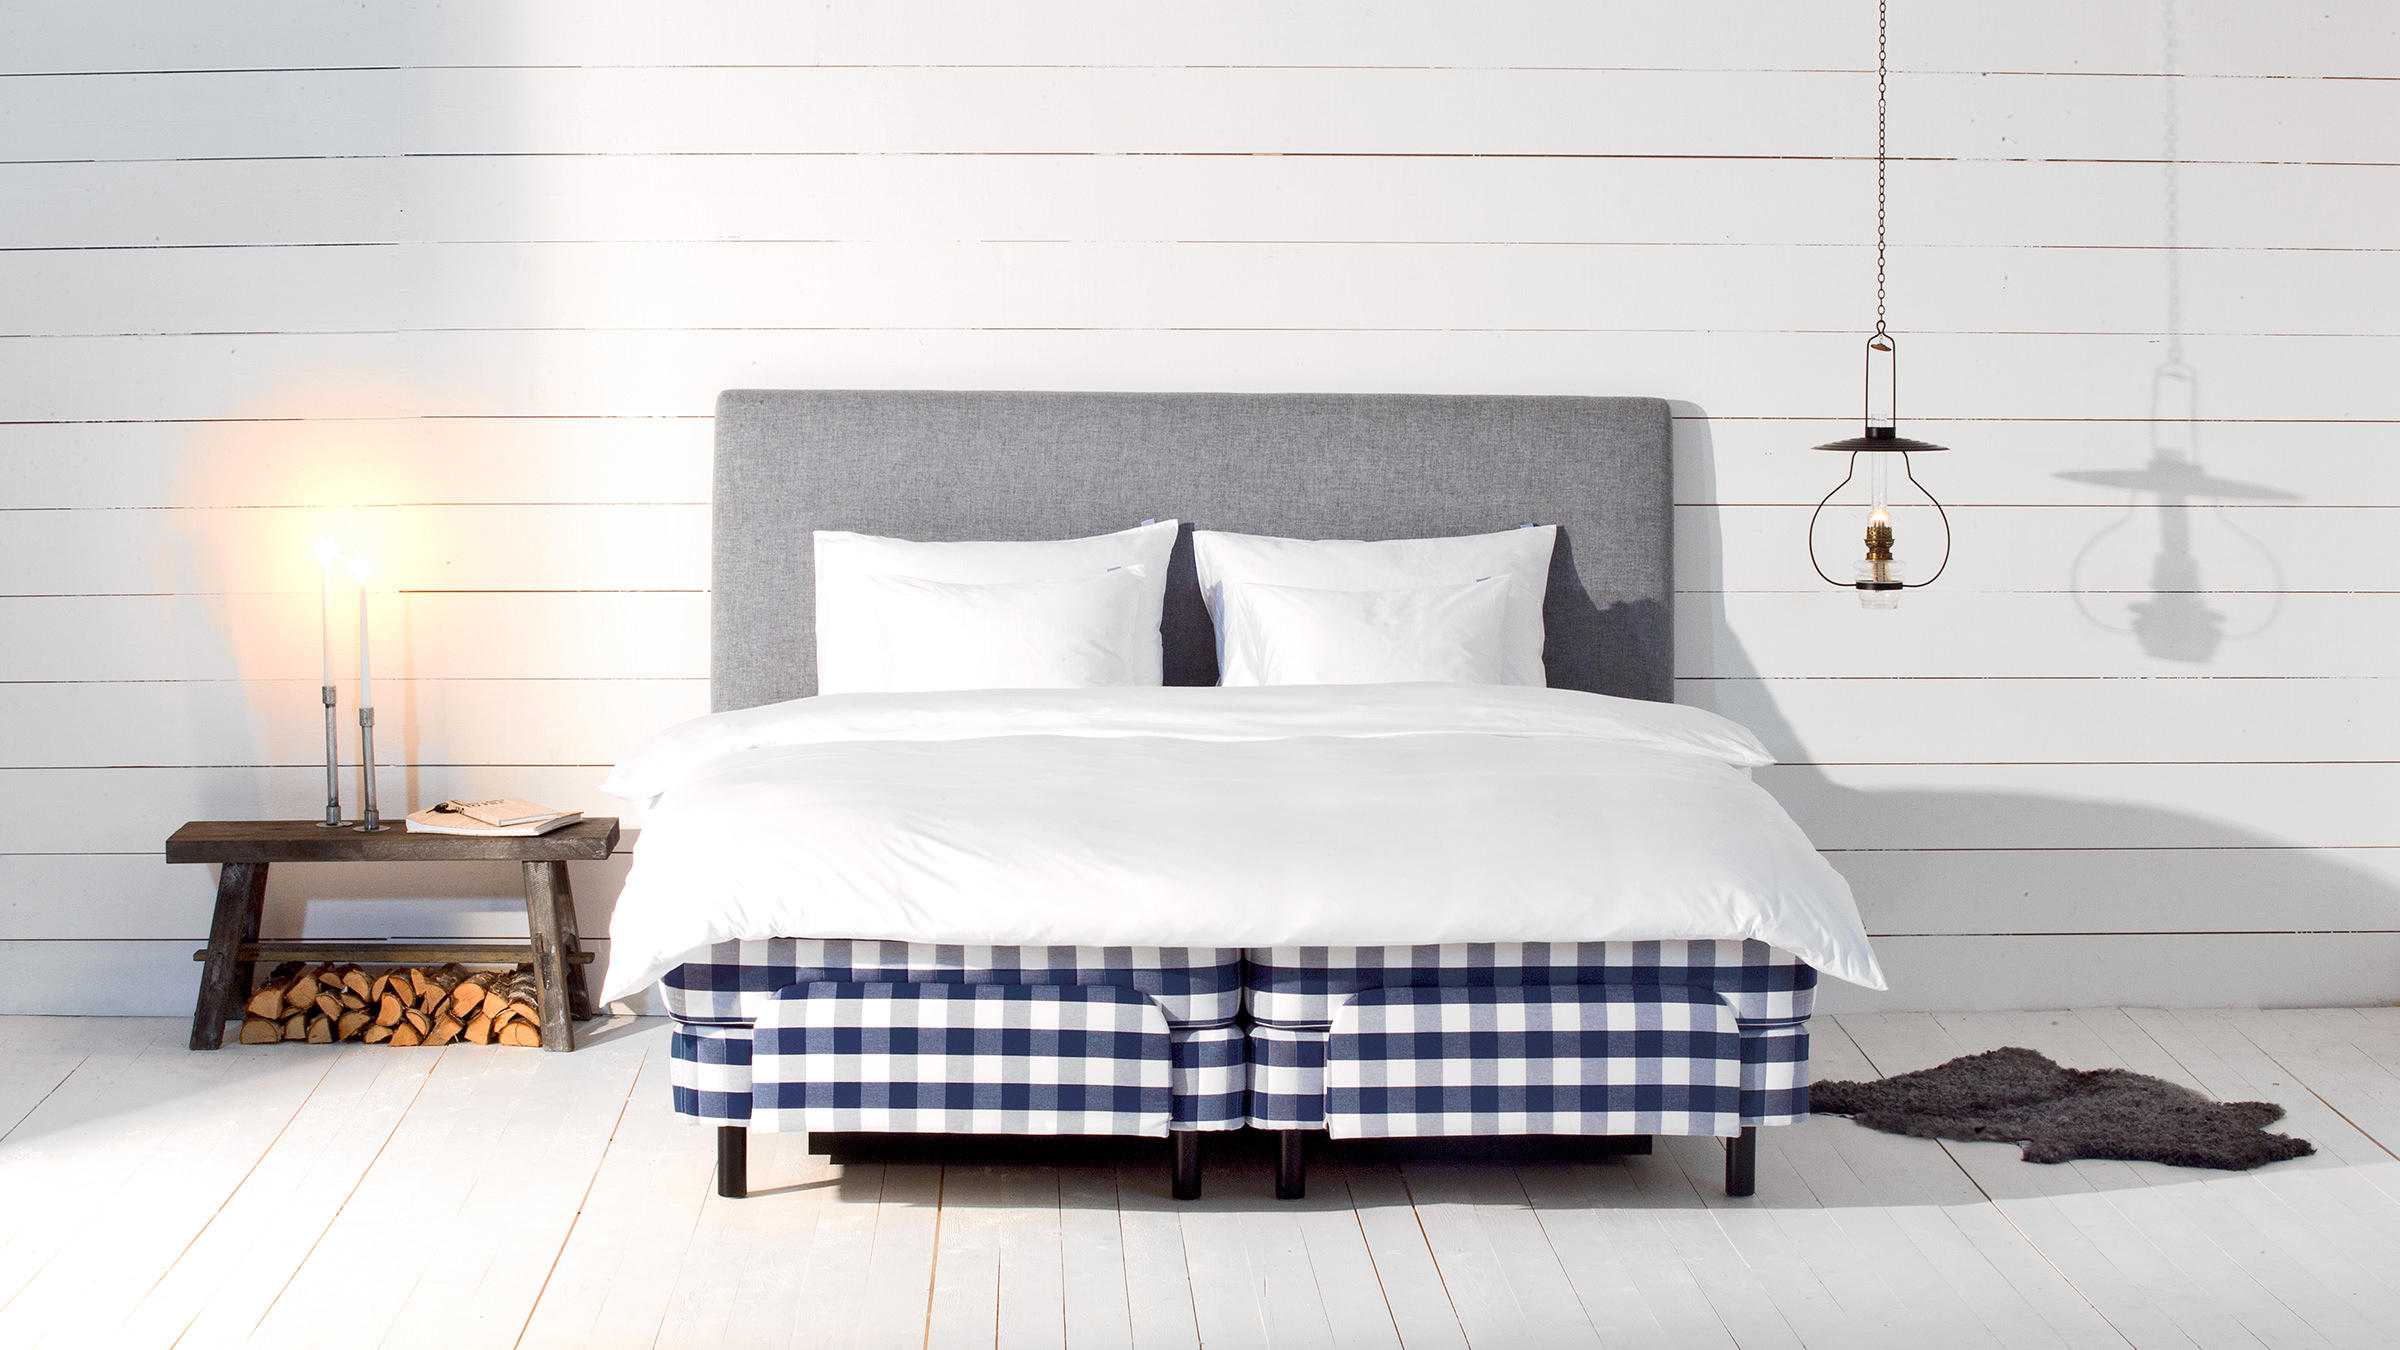 h stens novoria camas individuales de h stens architonic. Black Bedroom Furniture Sets. Home Design Ideas